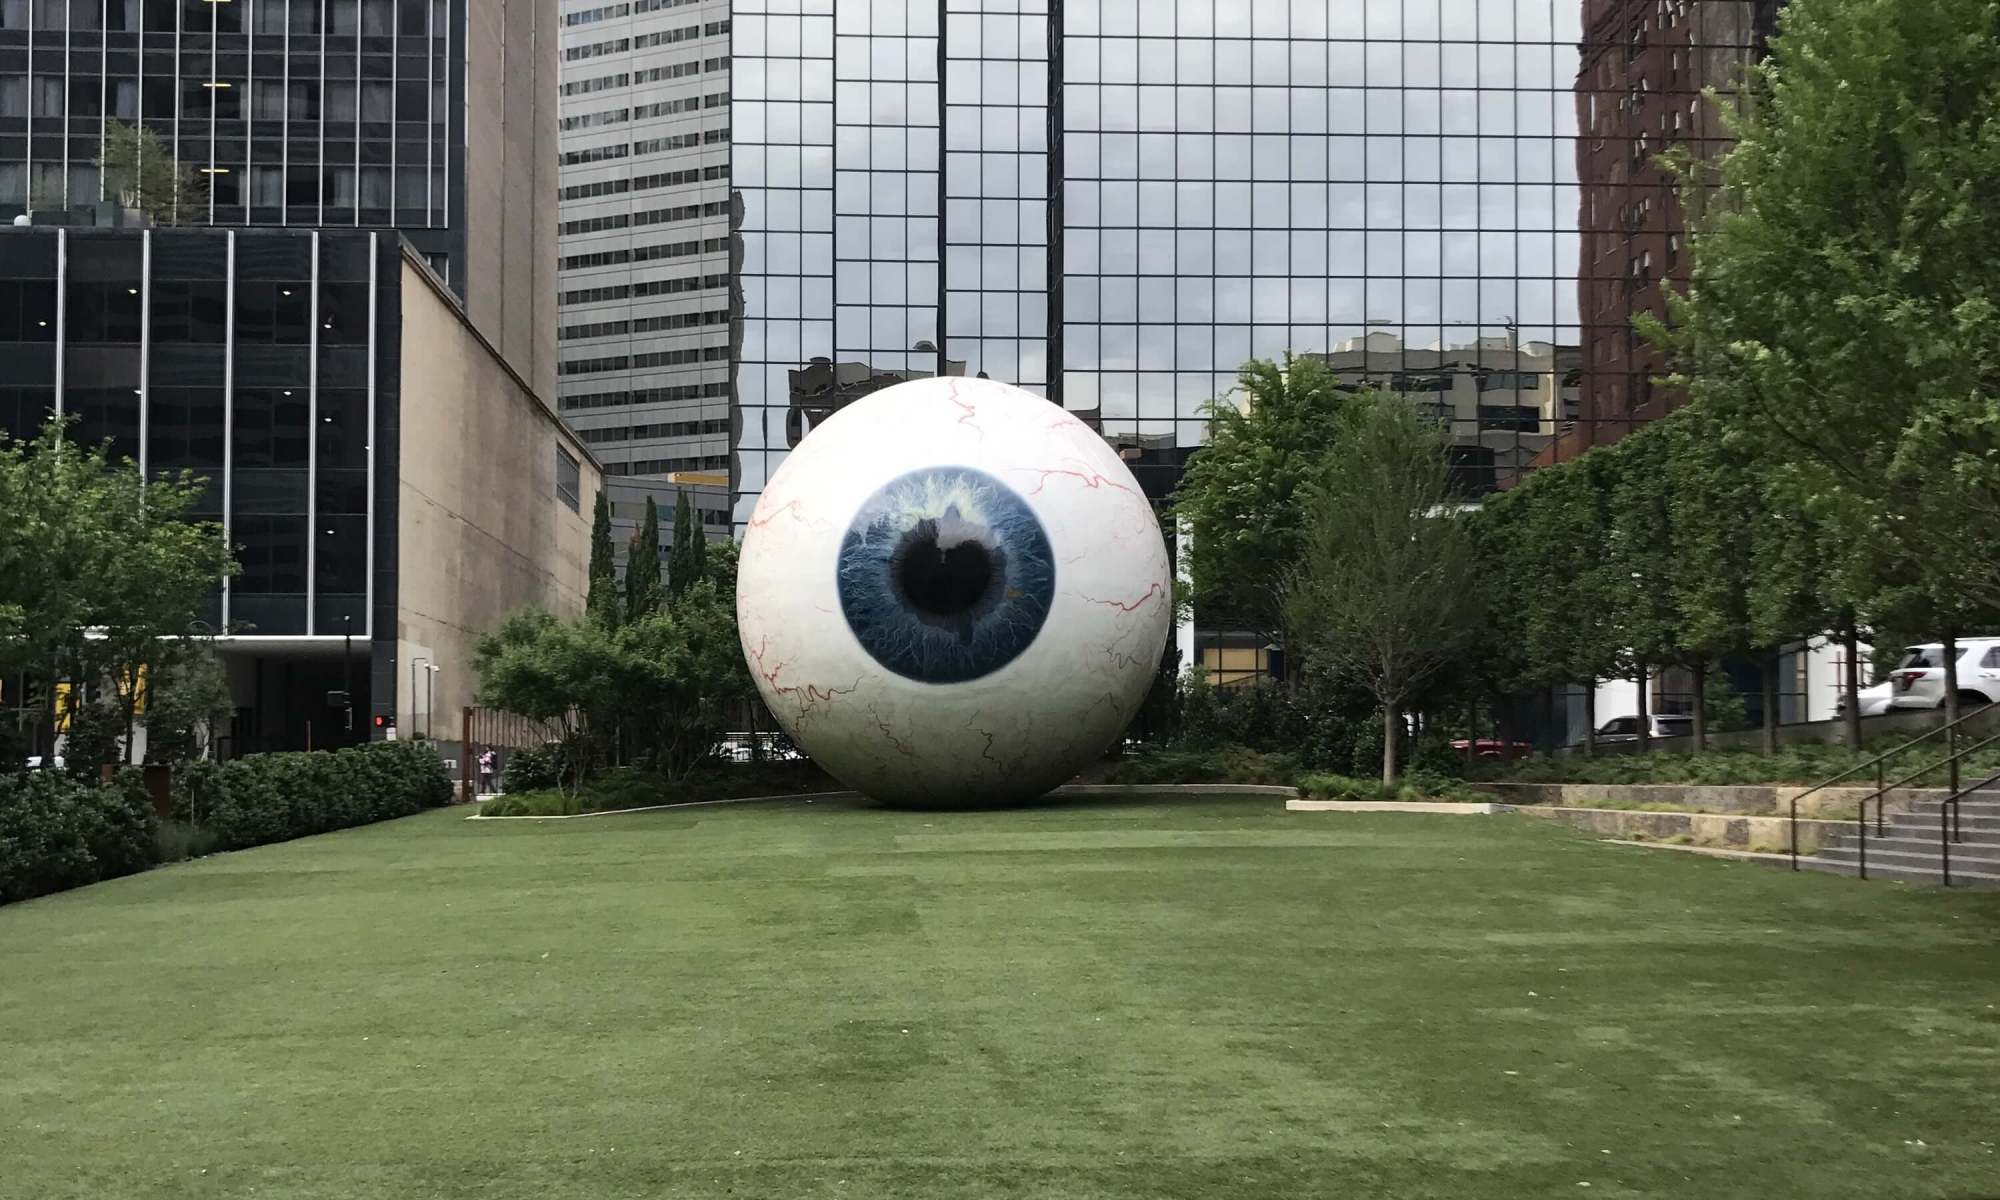 large eyeball sculpture in Dallas